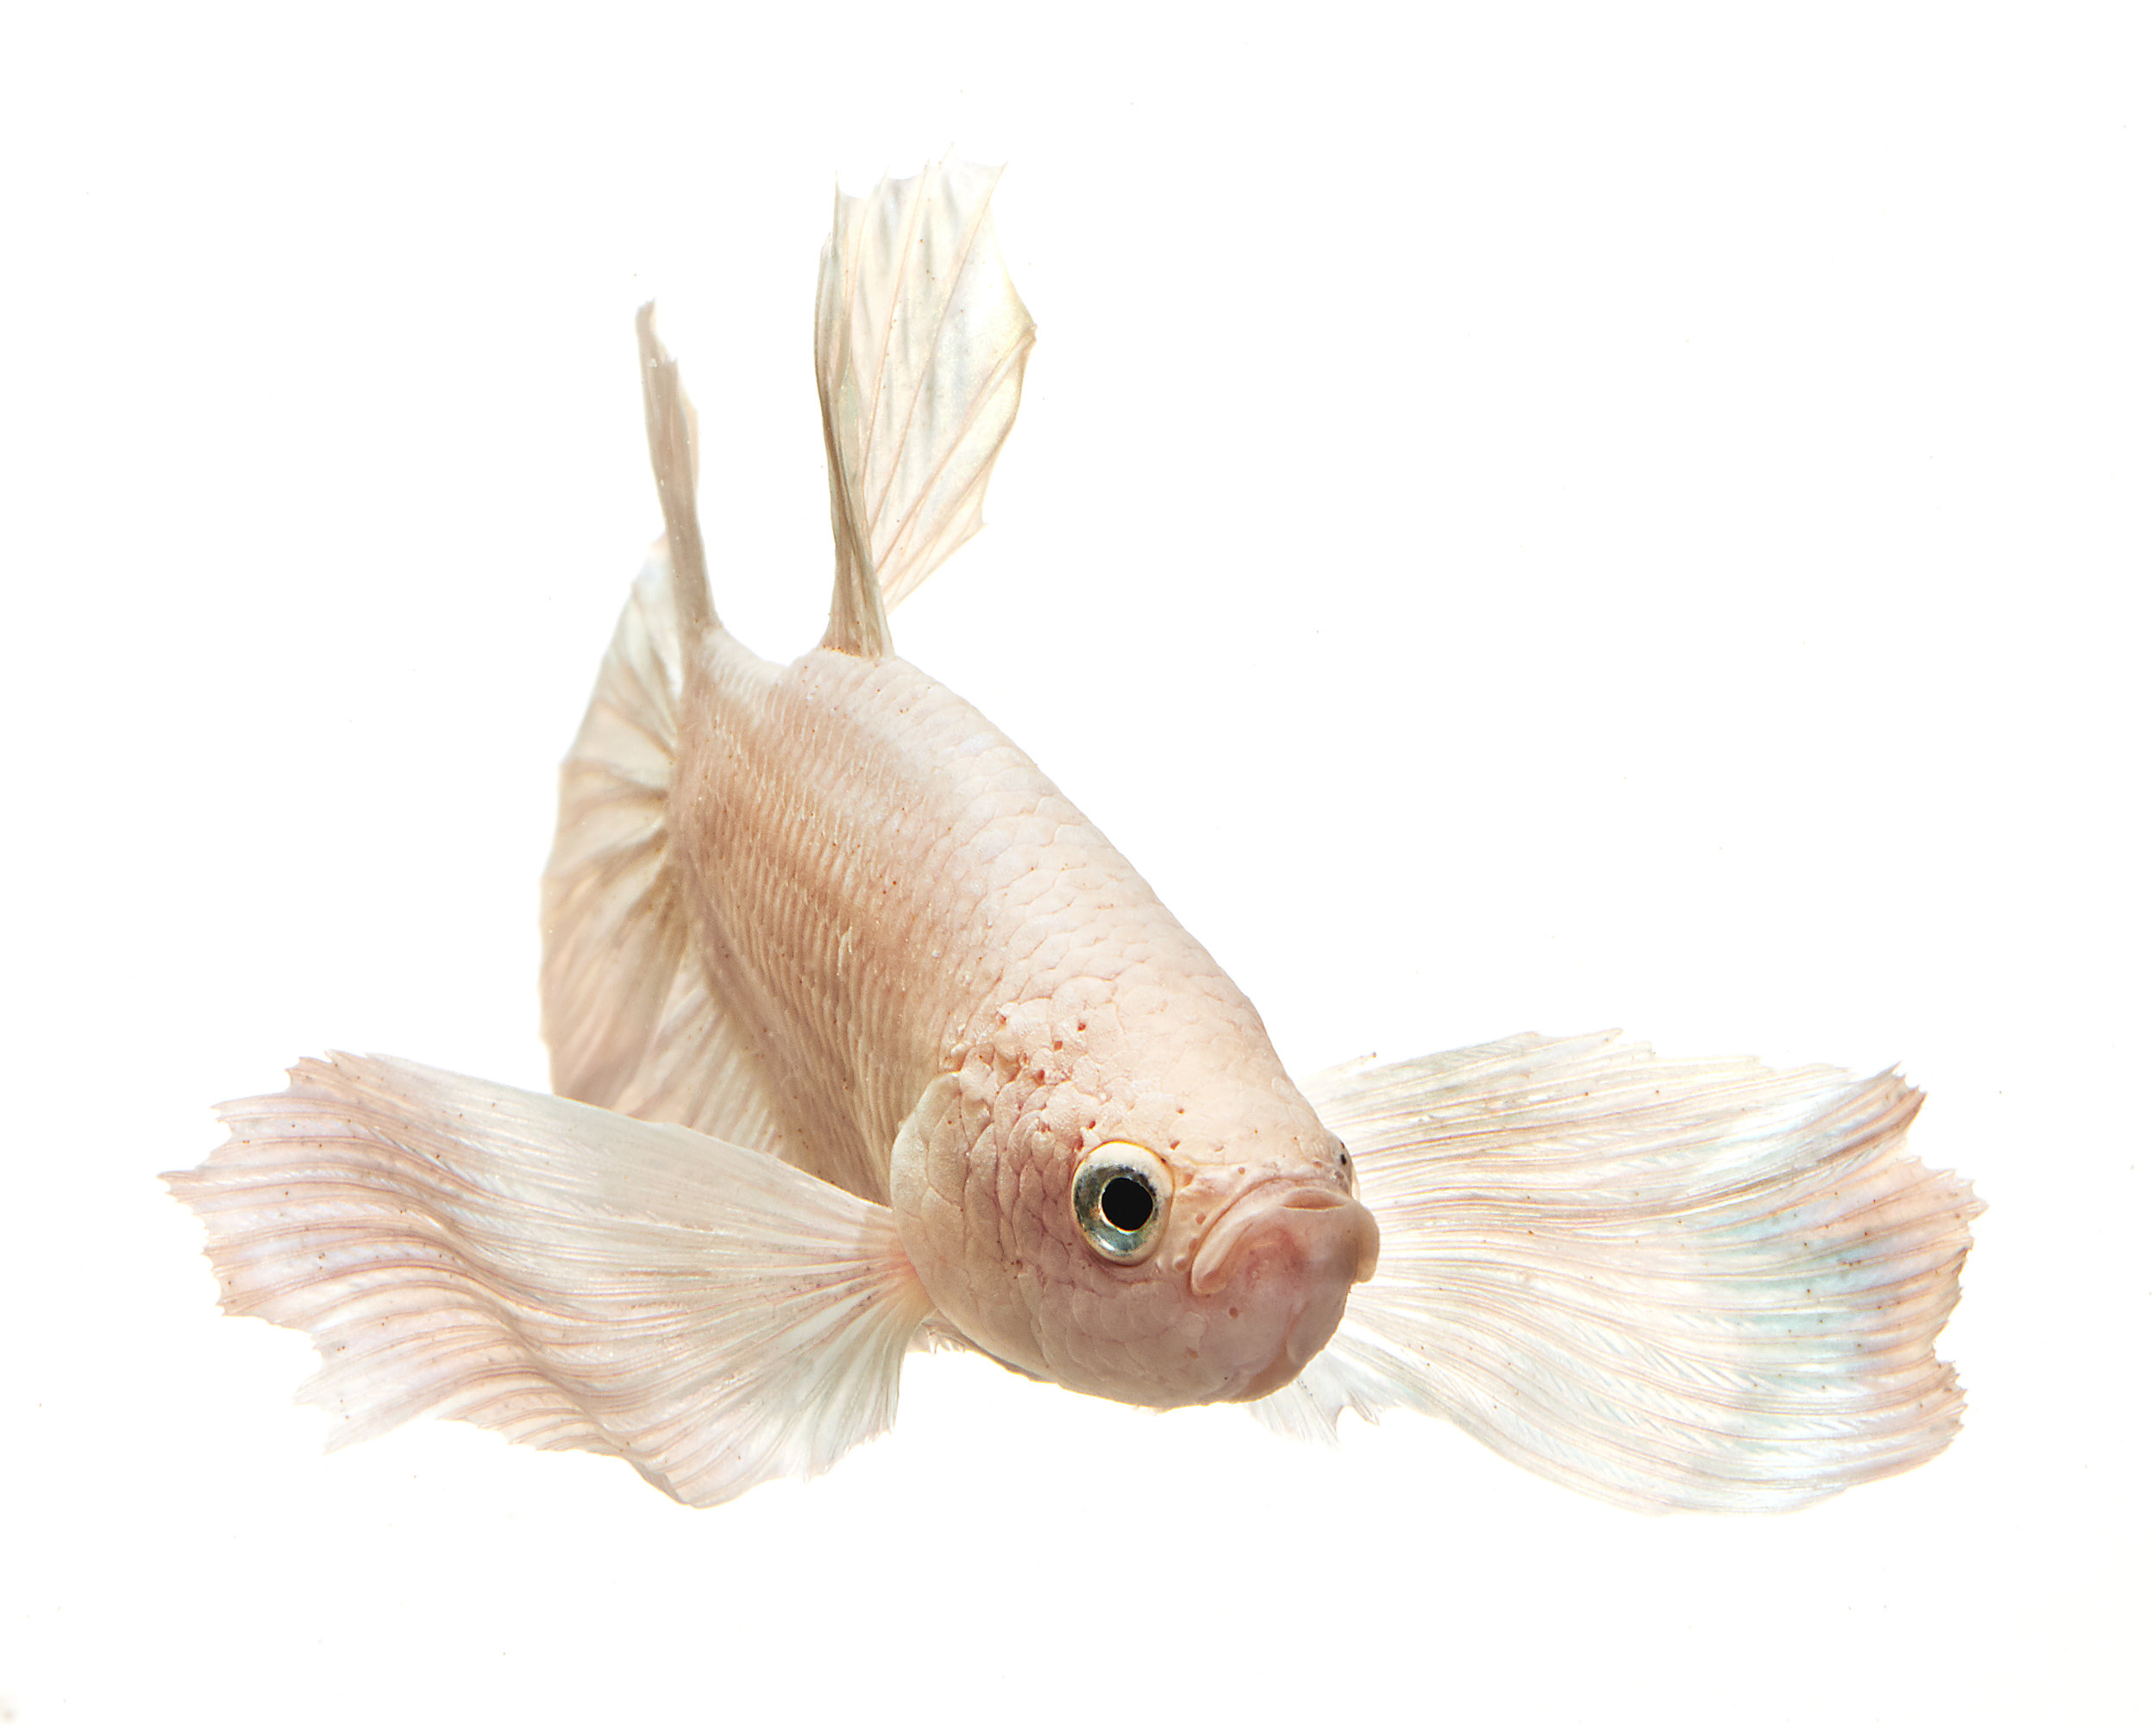 2019_Bettafish00089.jpg